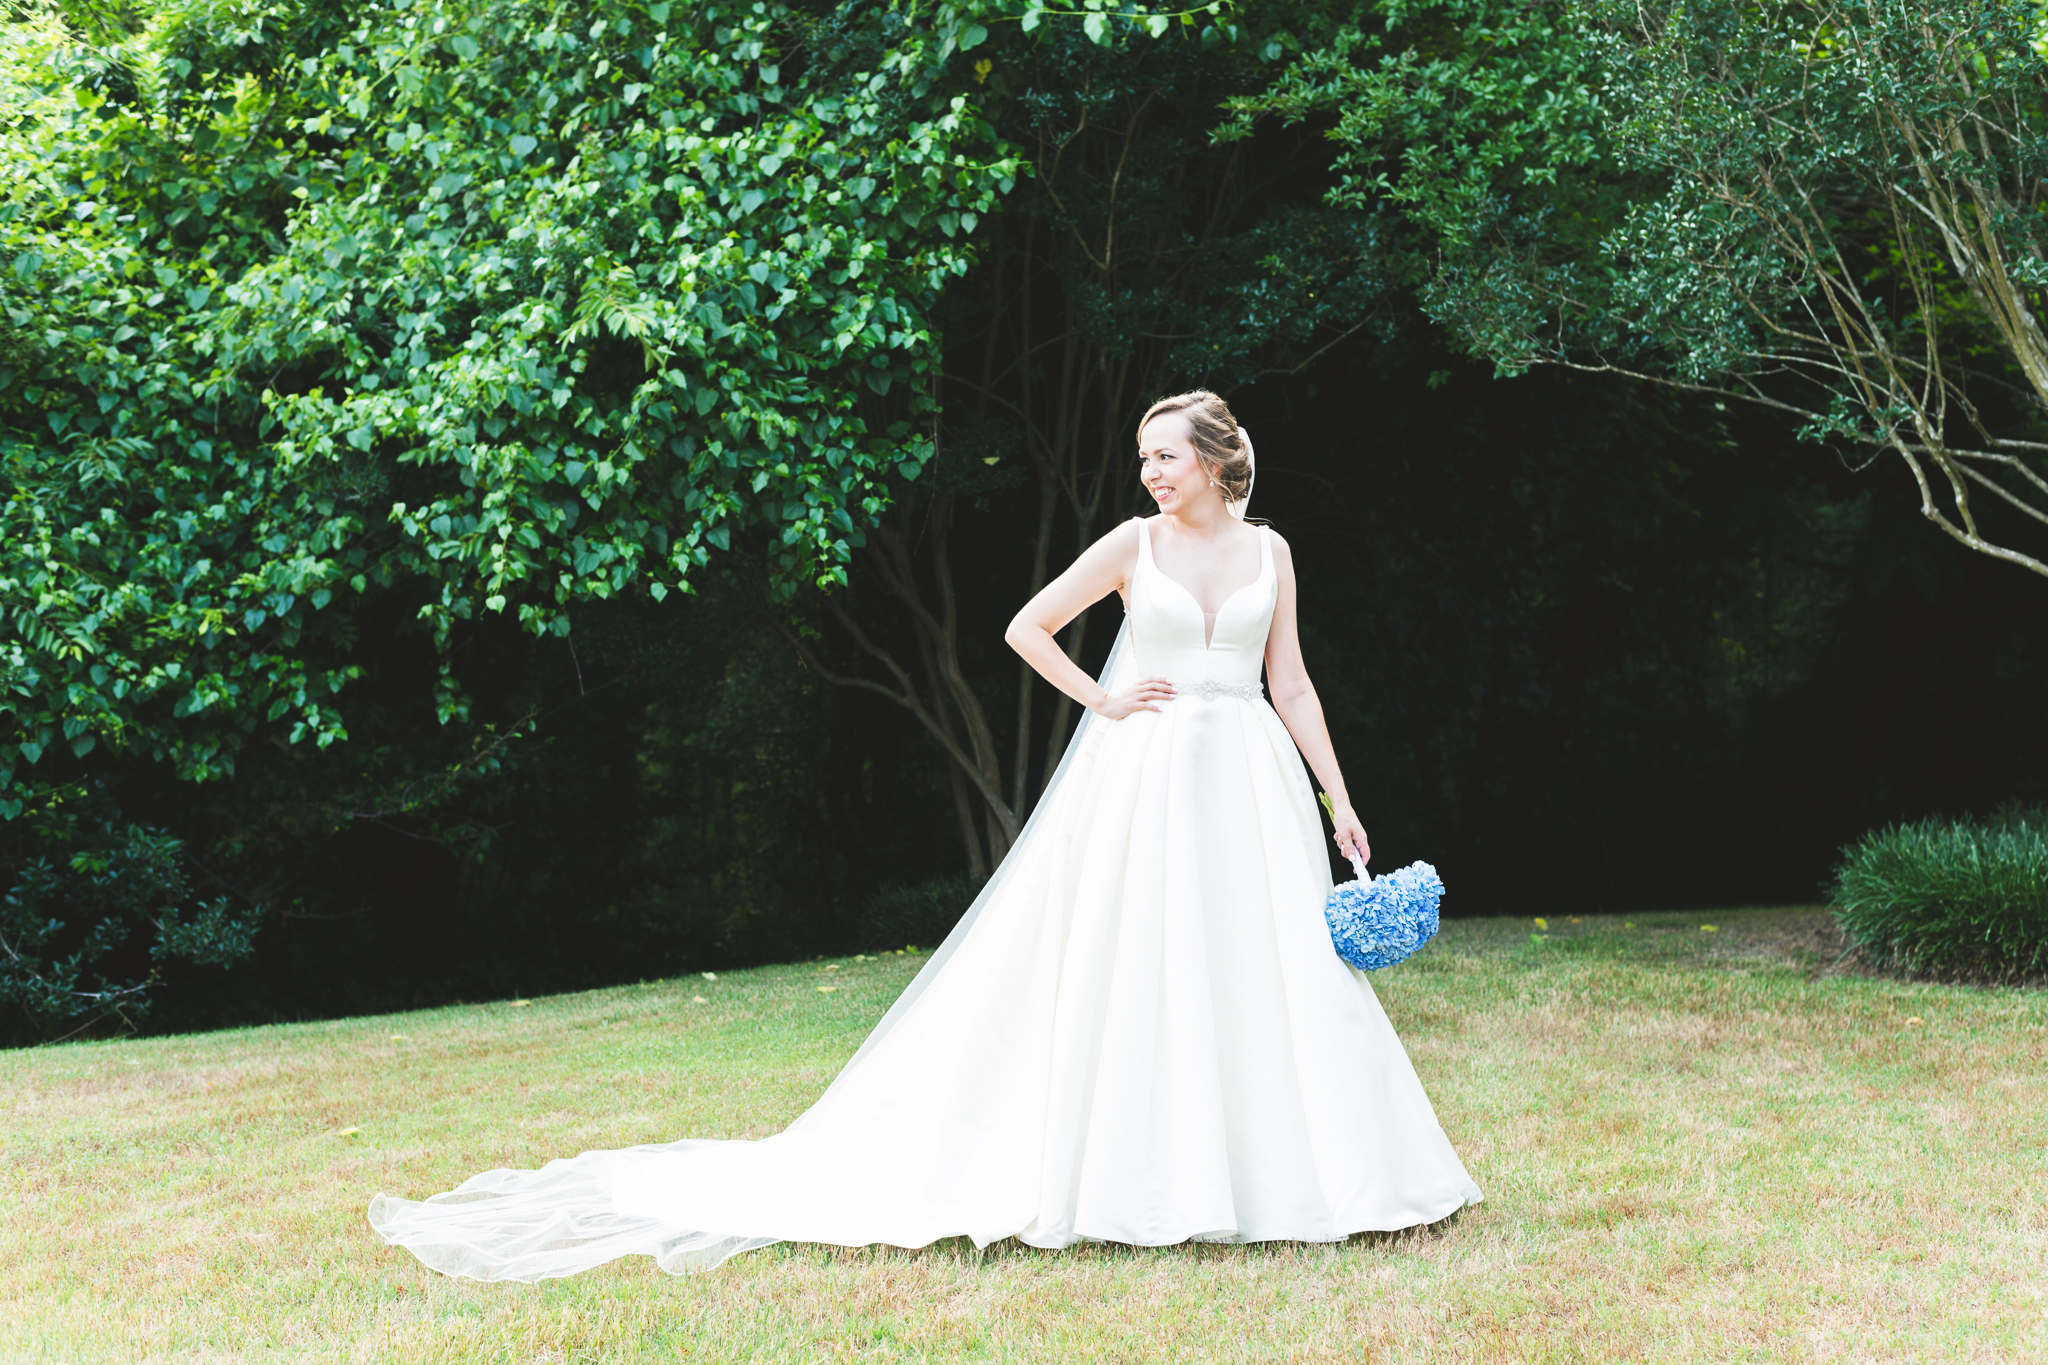 Bridals_MadisonReke_Blog-8.jpg